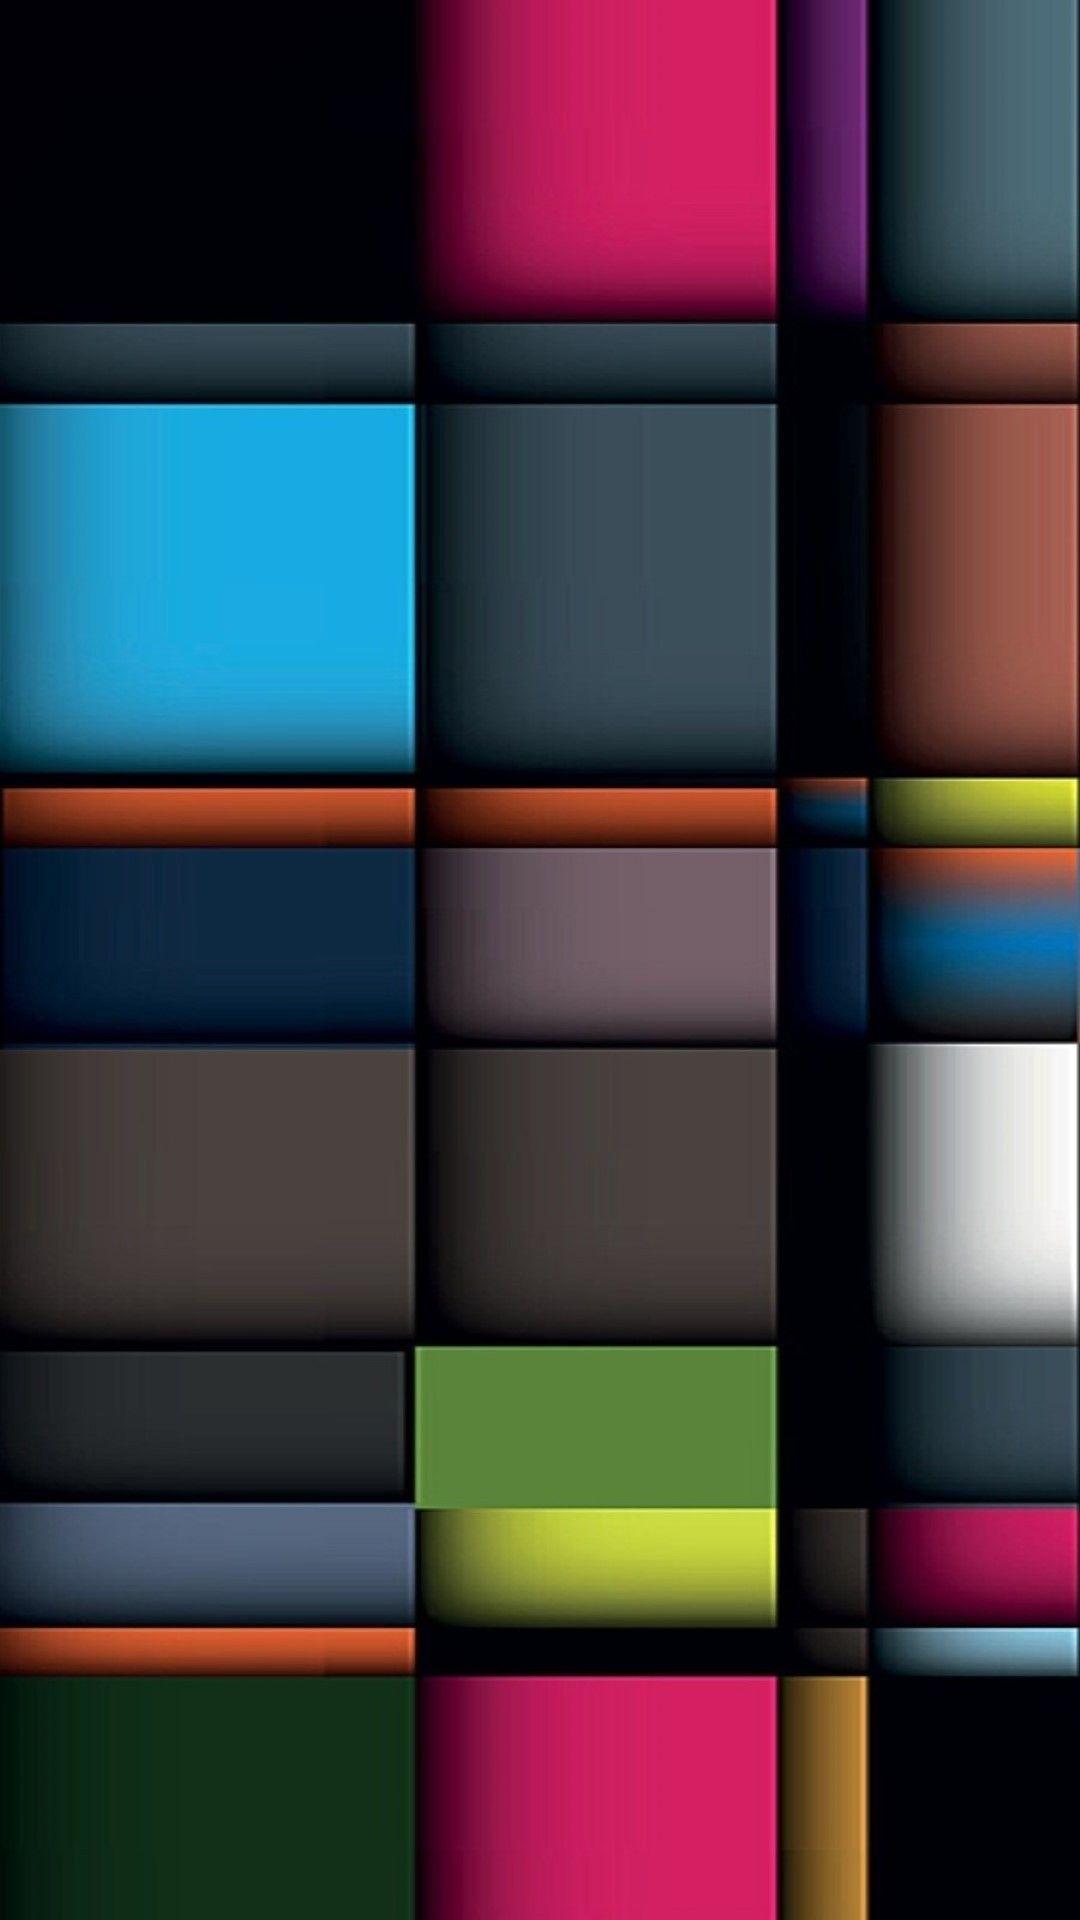 Iphone Wallpaper Colorful 3d Pattern Oboi Oboi Fony Oboi Dlya